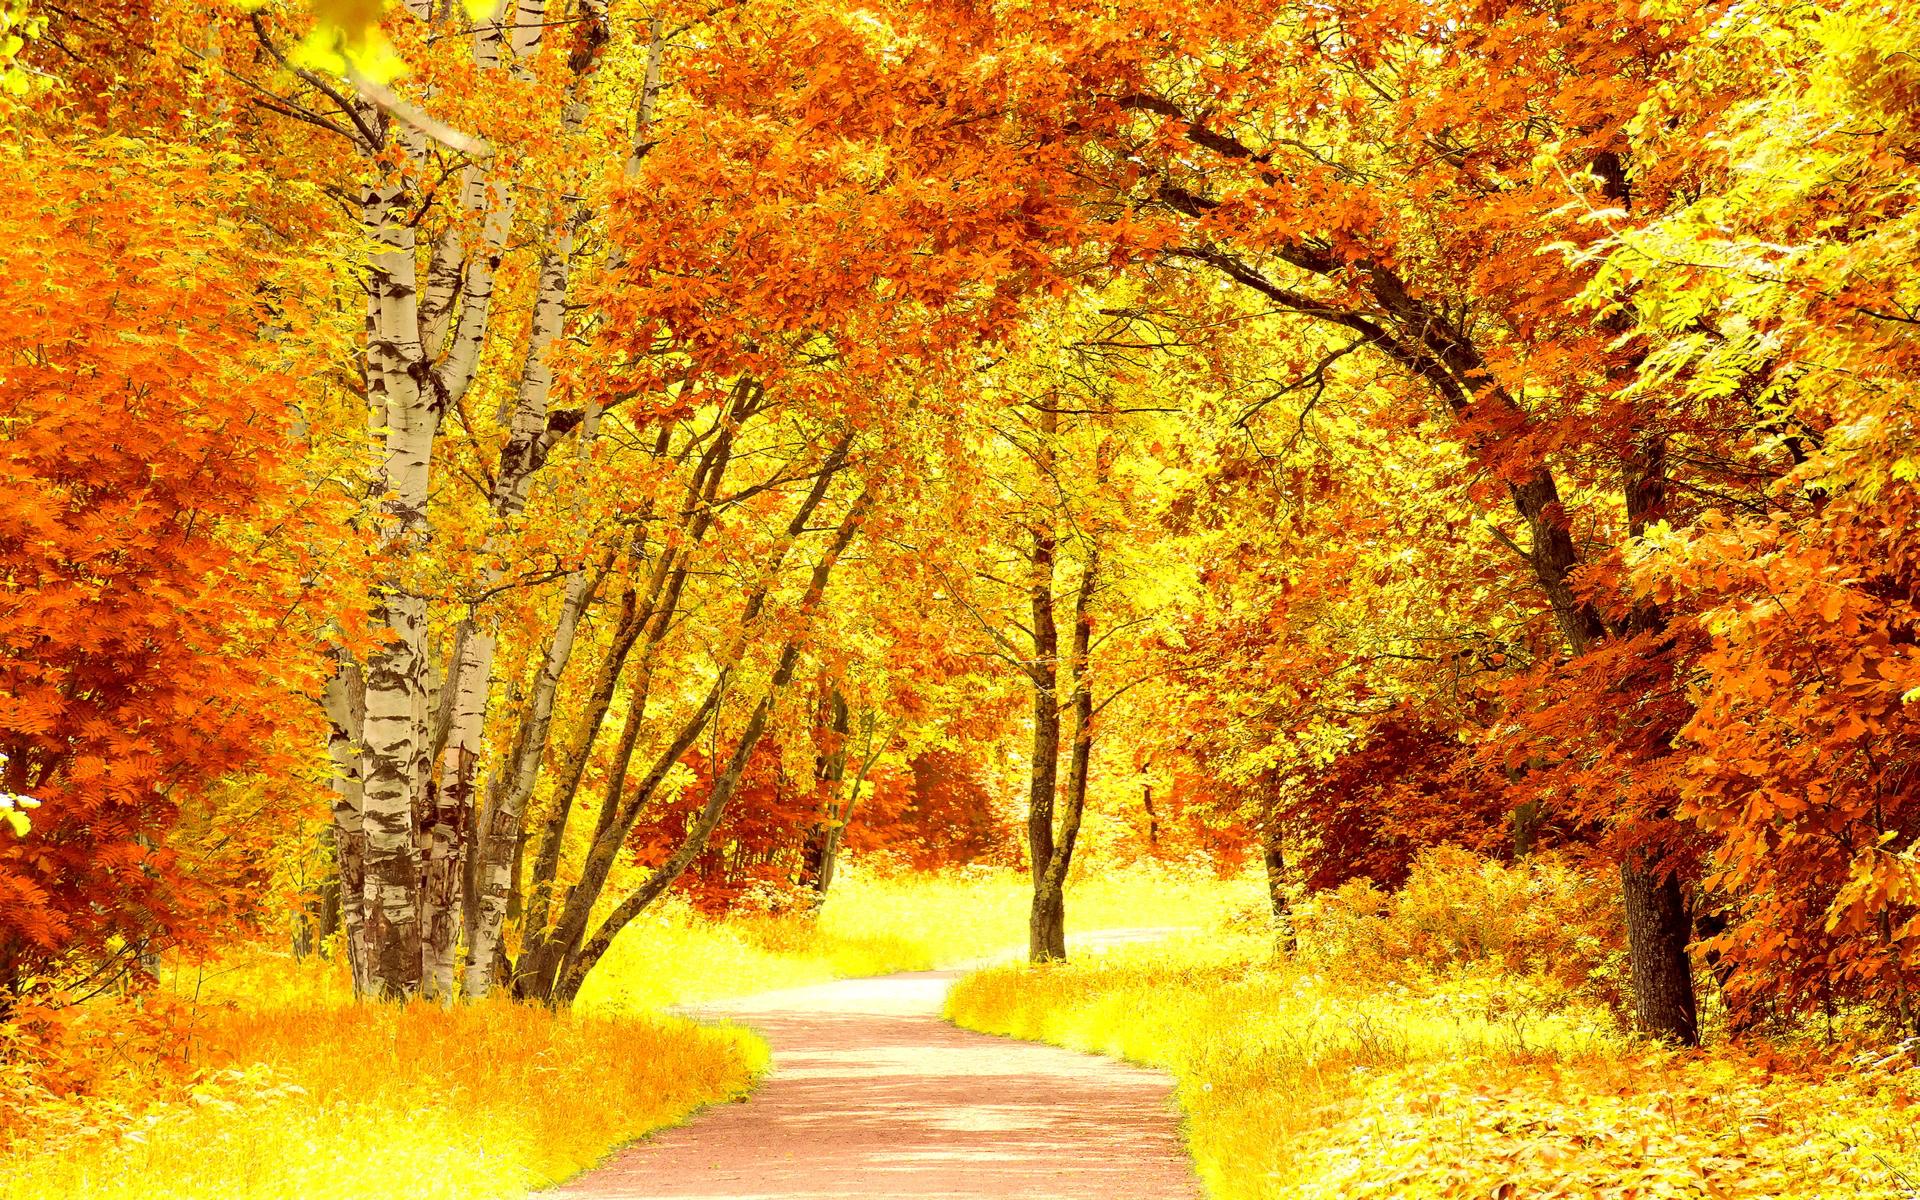 Red yellow autumn scenery